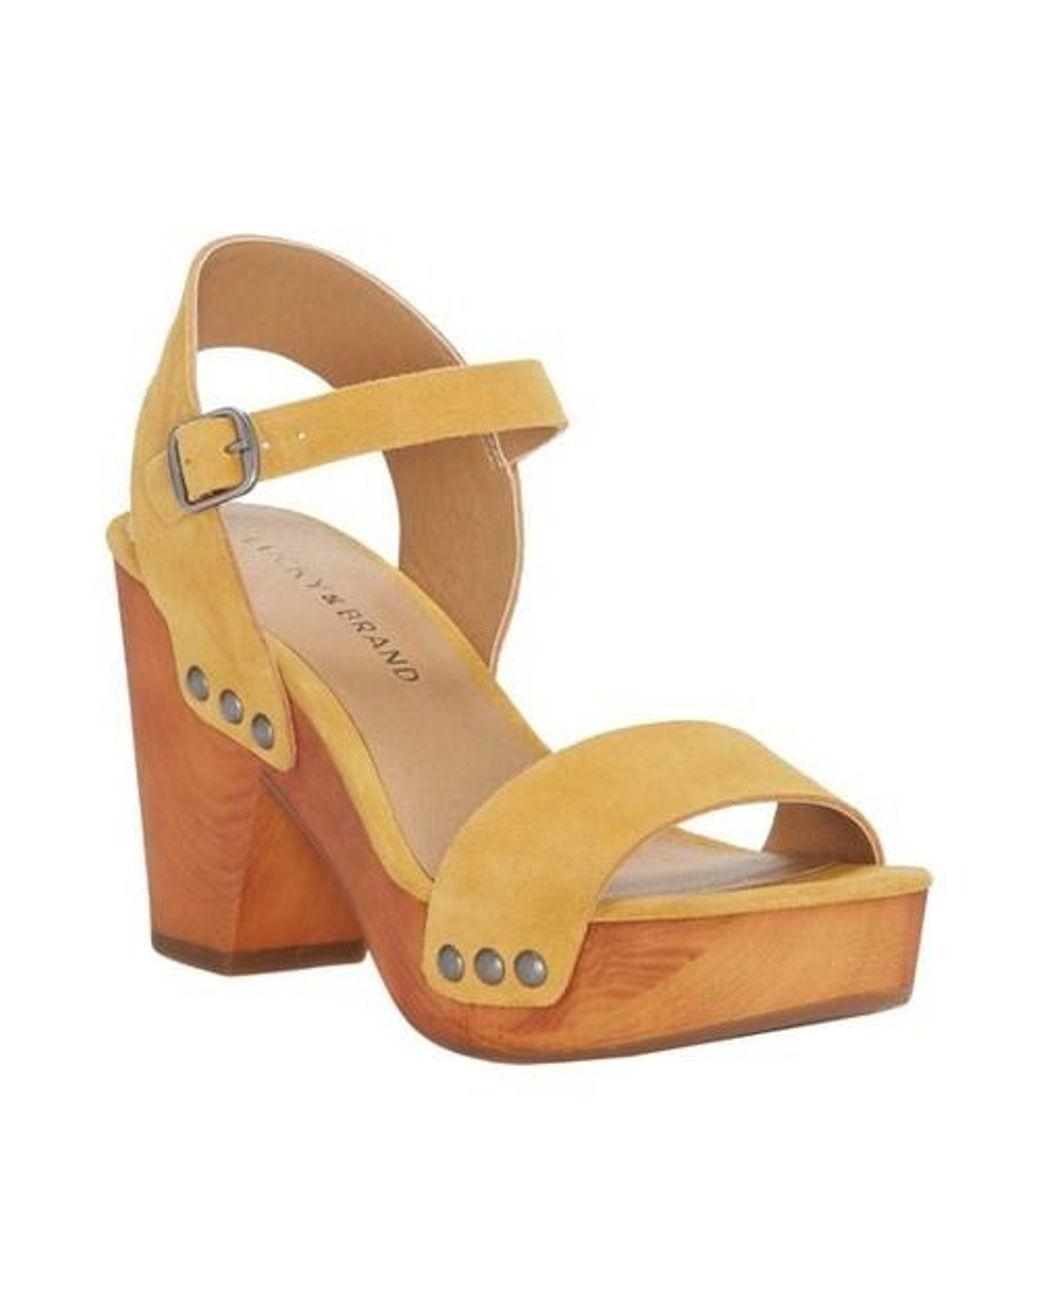 1188b04d98ce Lyst - Lucky Brand Trisa Ankle Strap Platform Sandal - Save 10%